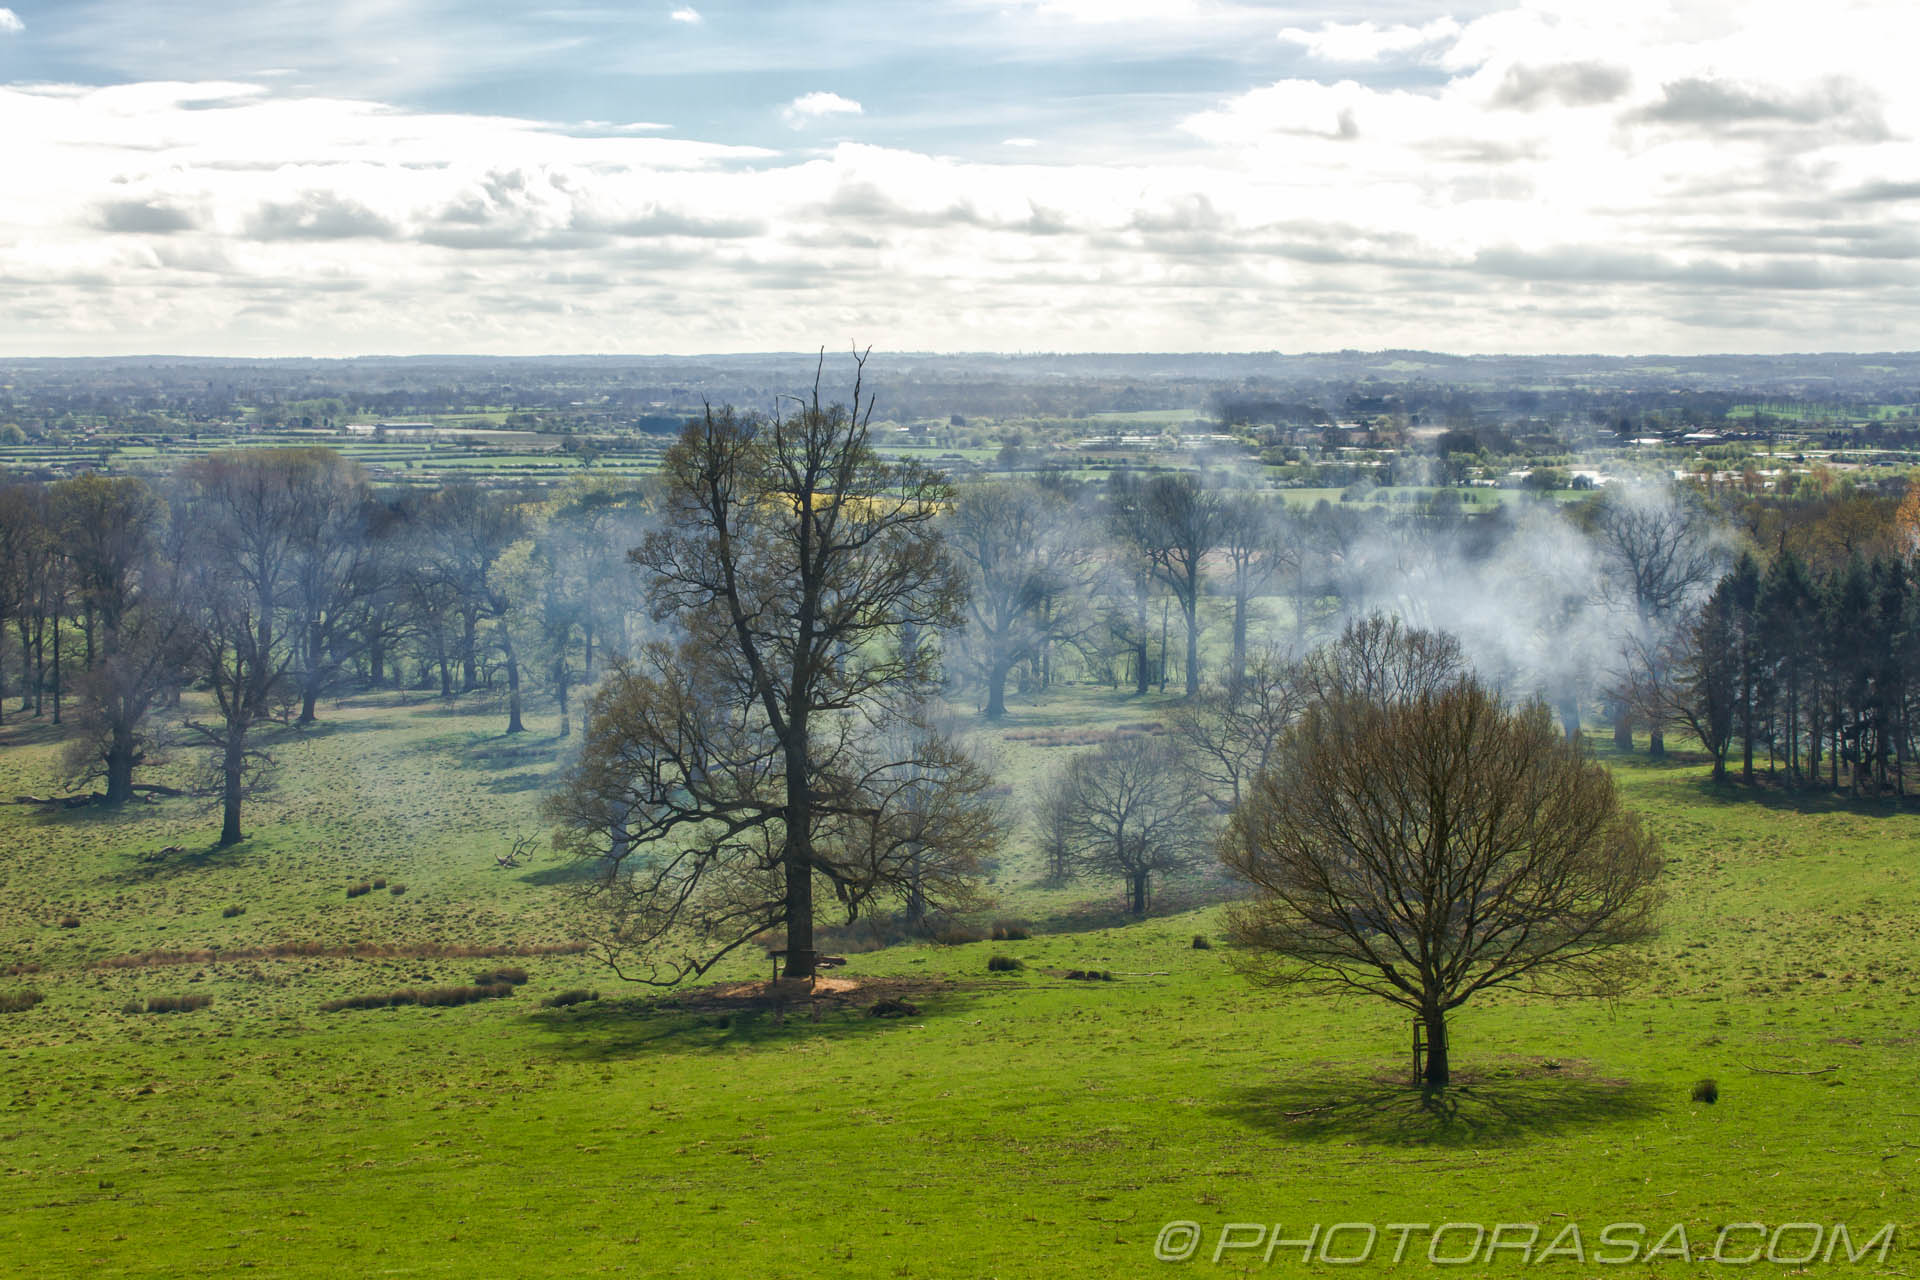 http://photorasa.com/view-boughton-monchelsea-churchyard/smoke-across-the-deer-park/